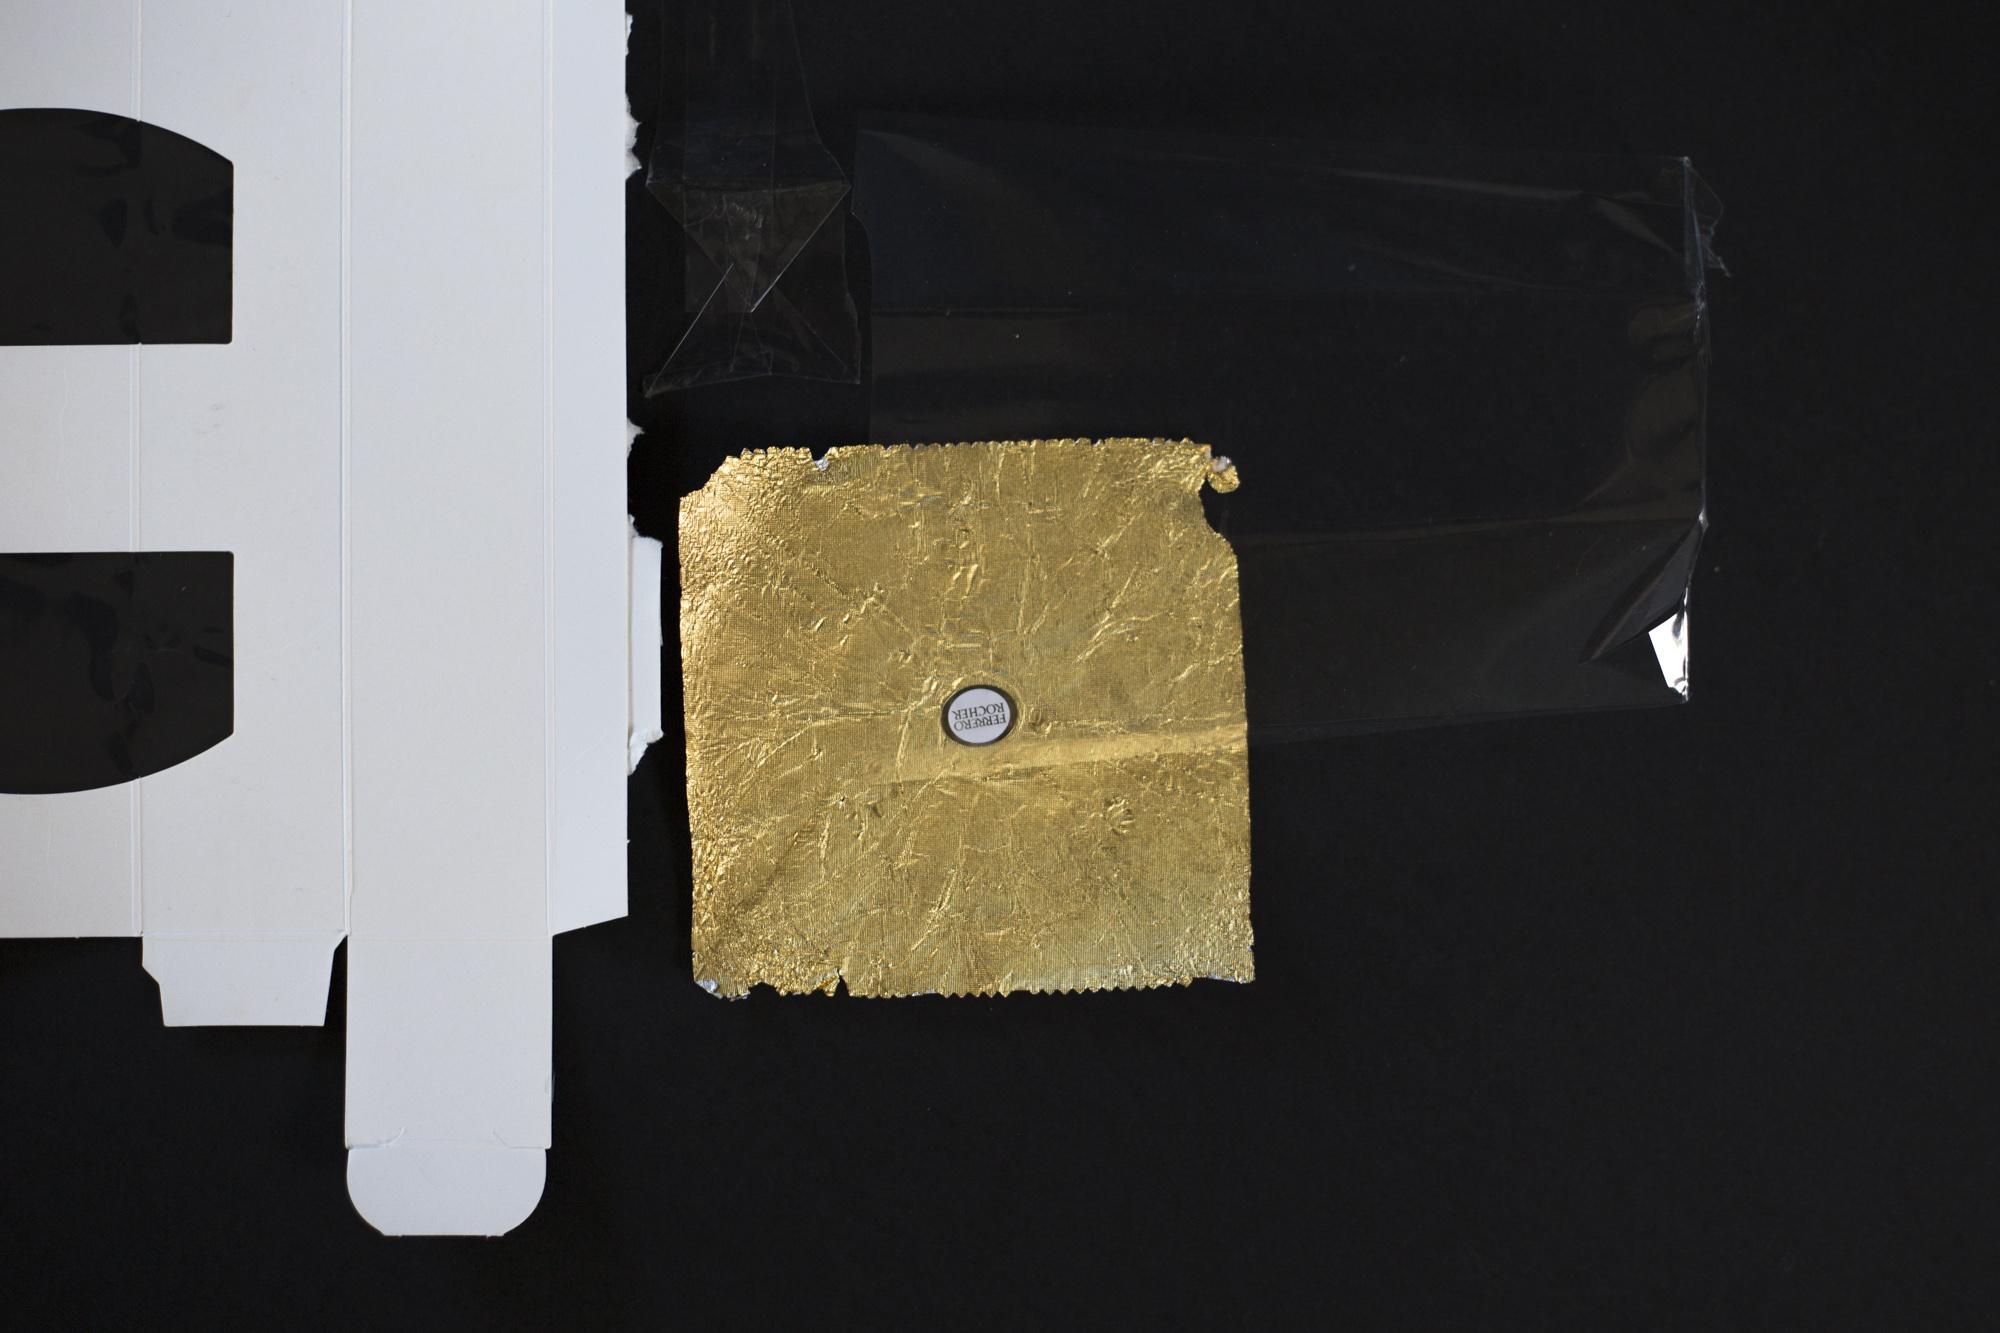 Unwrapped-11.jpg